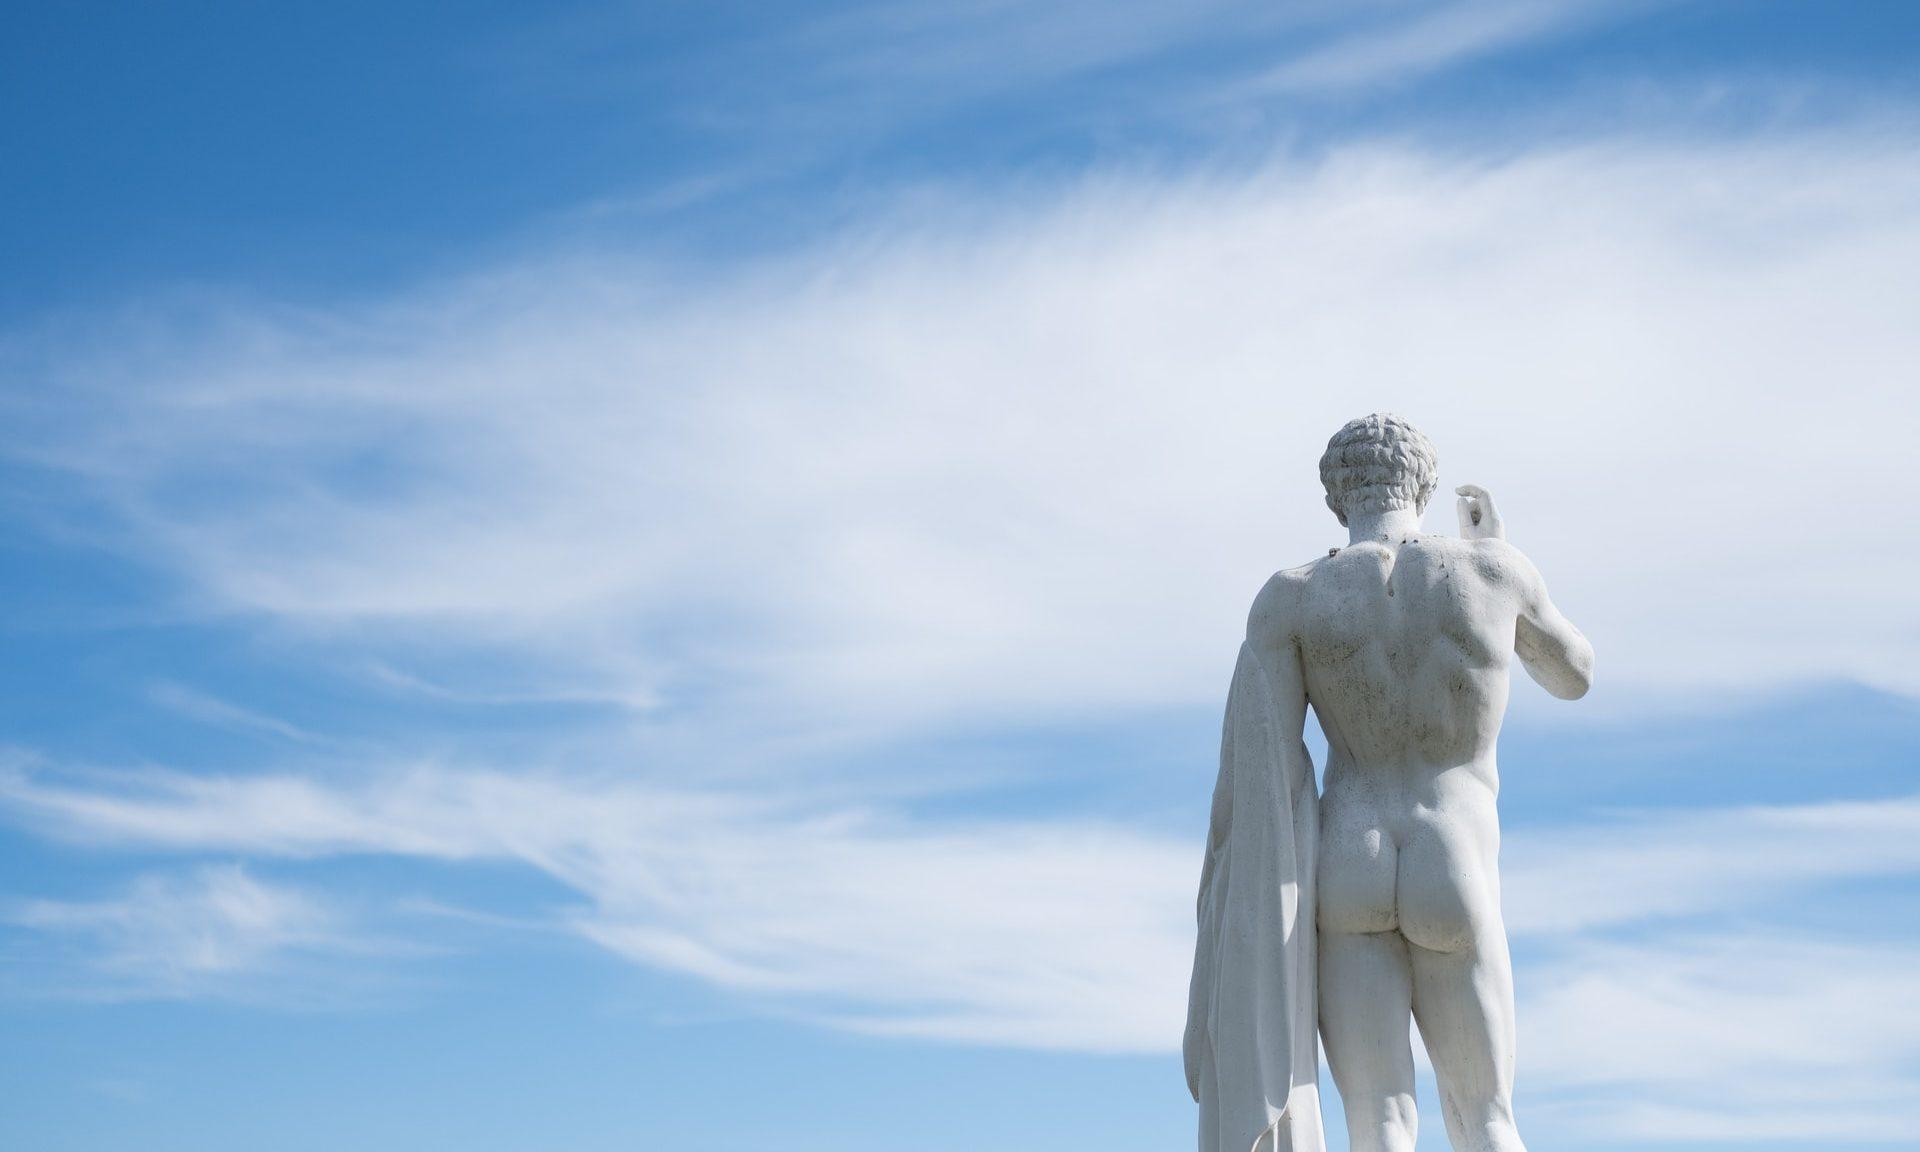 estatua-unsplash